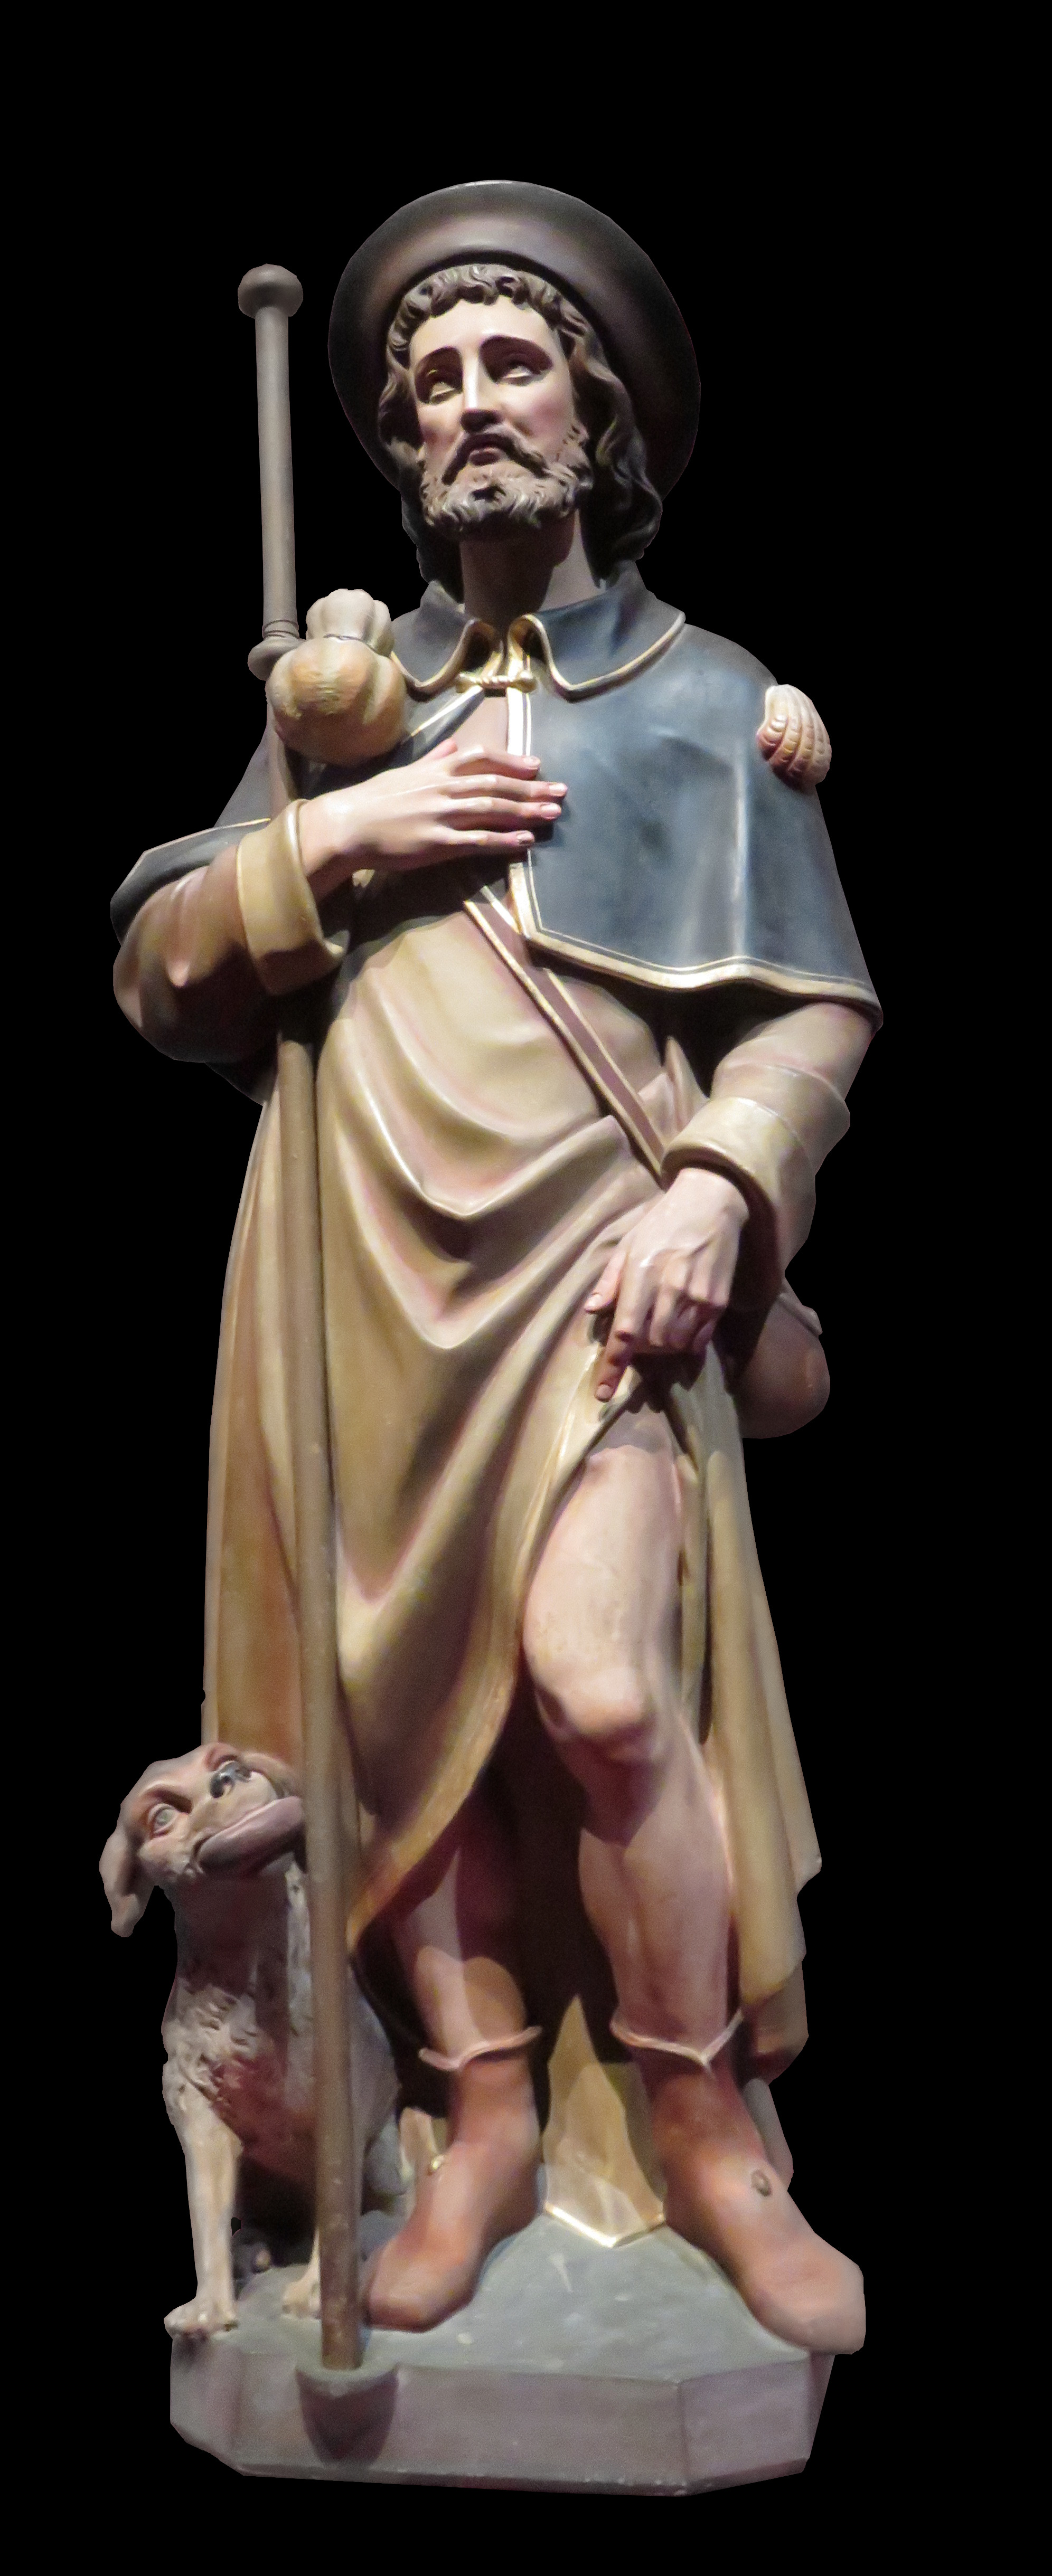 File:Saint Roch - original - transparent background.jpg ...